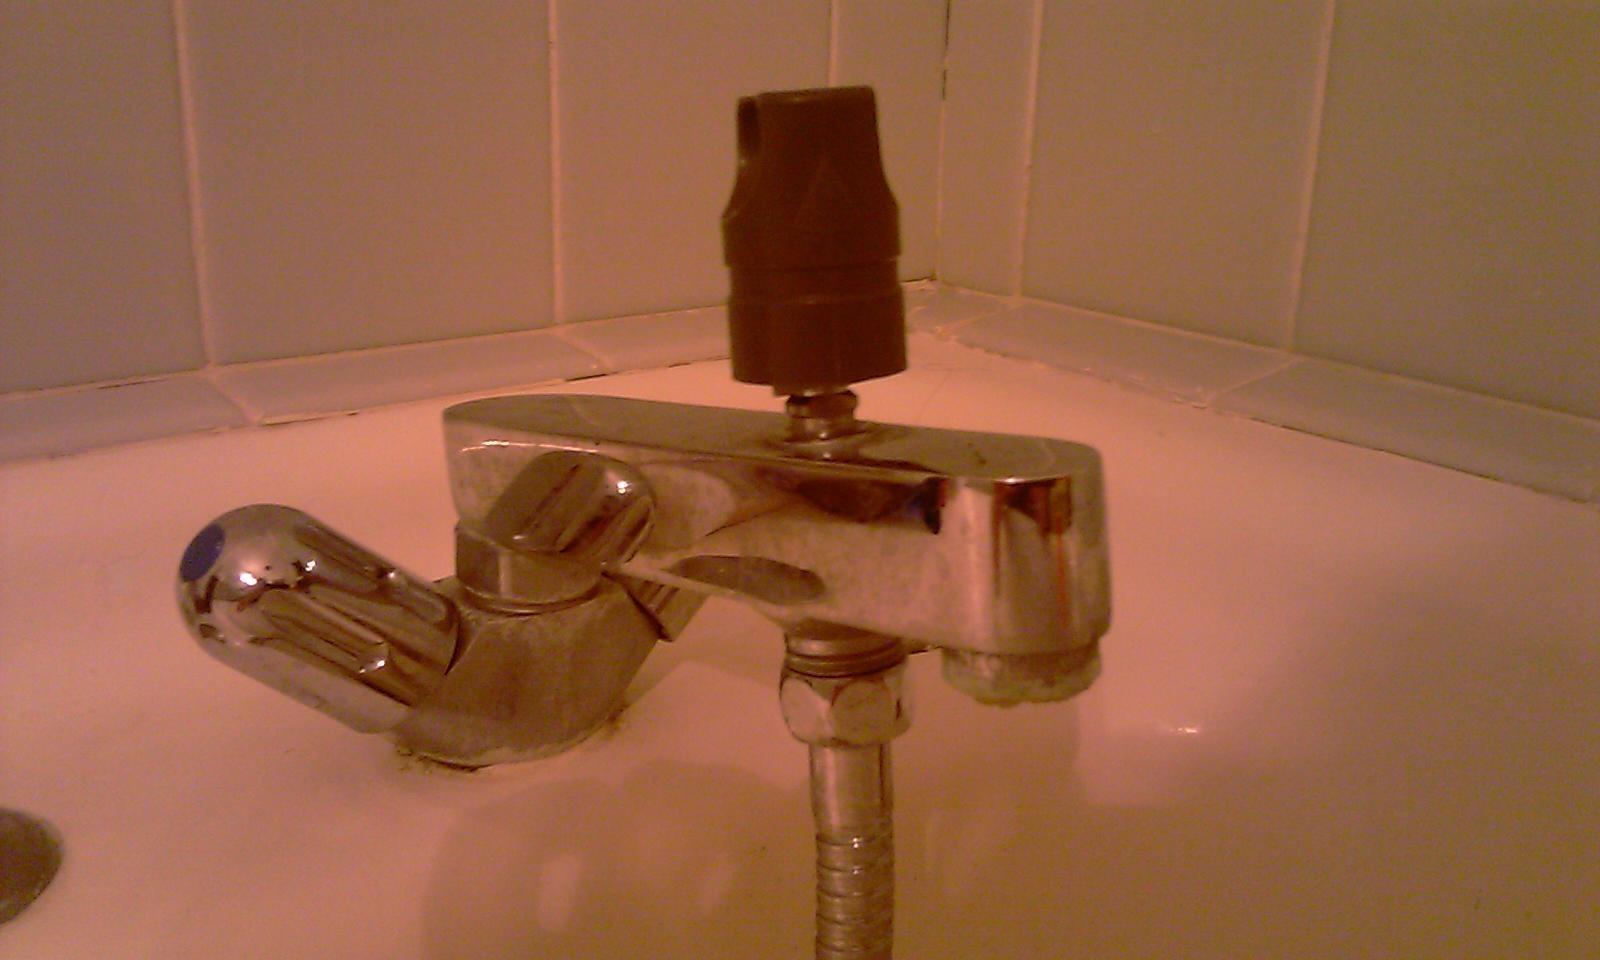 Demonter un ancien robinet melangeur bain-douche